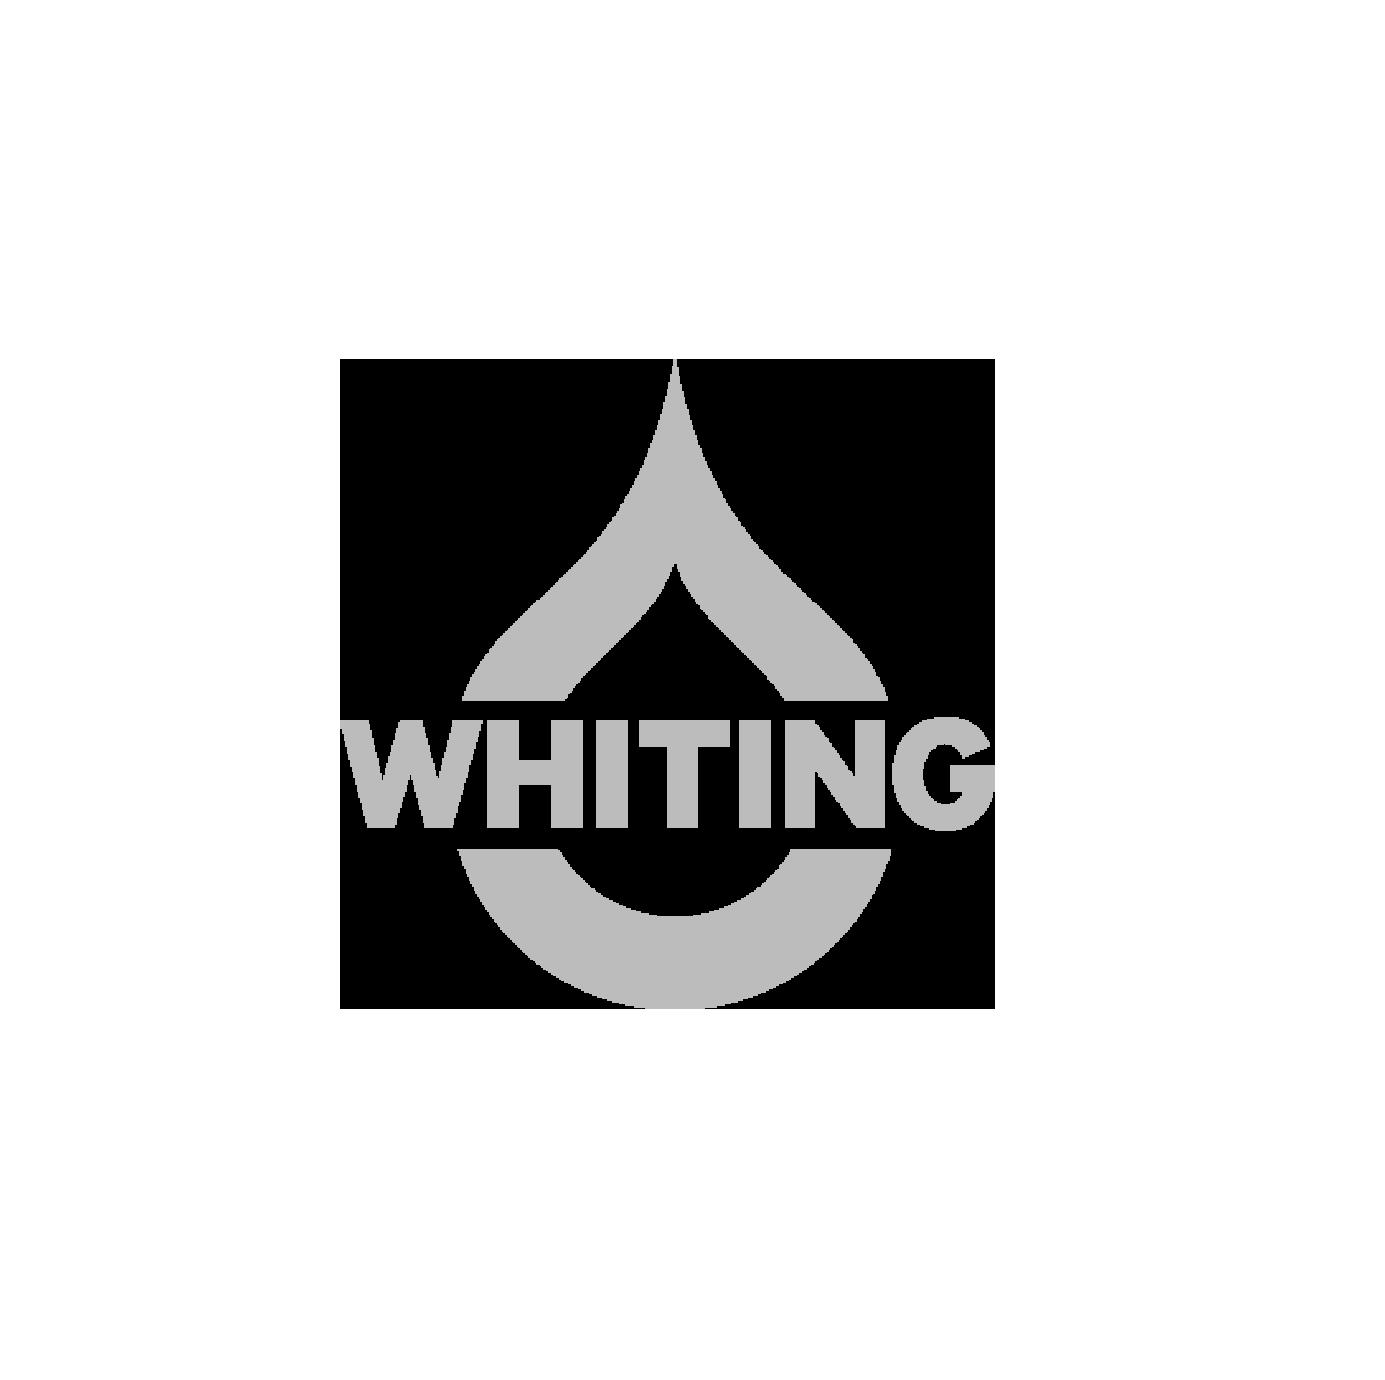 whiting_logo.png